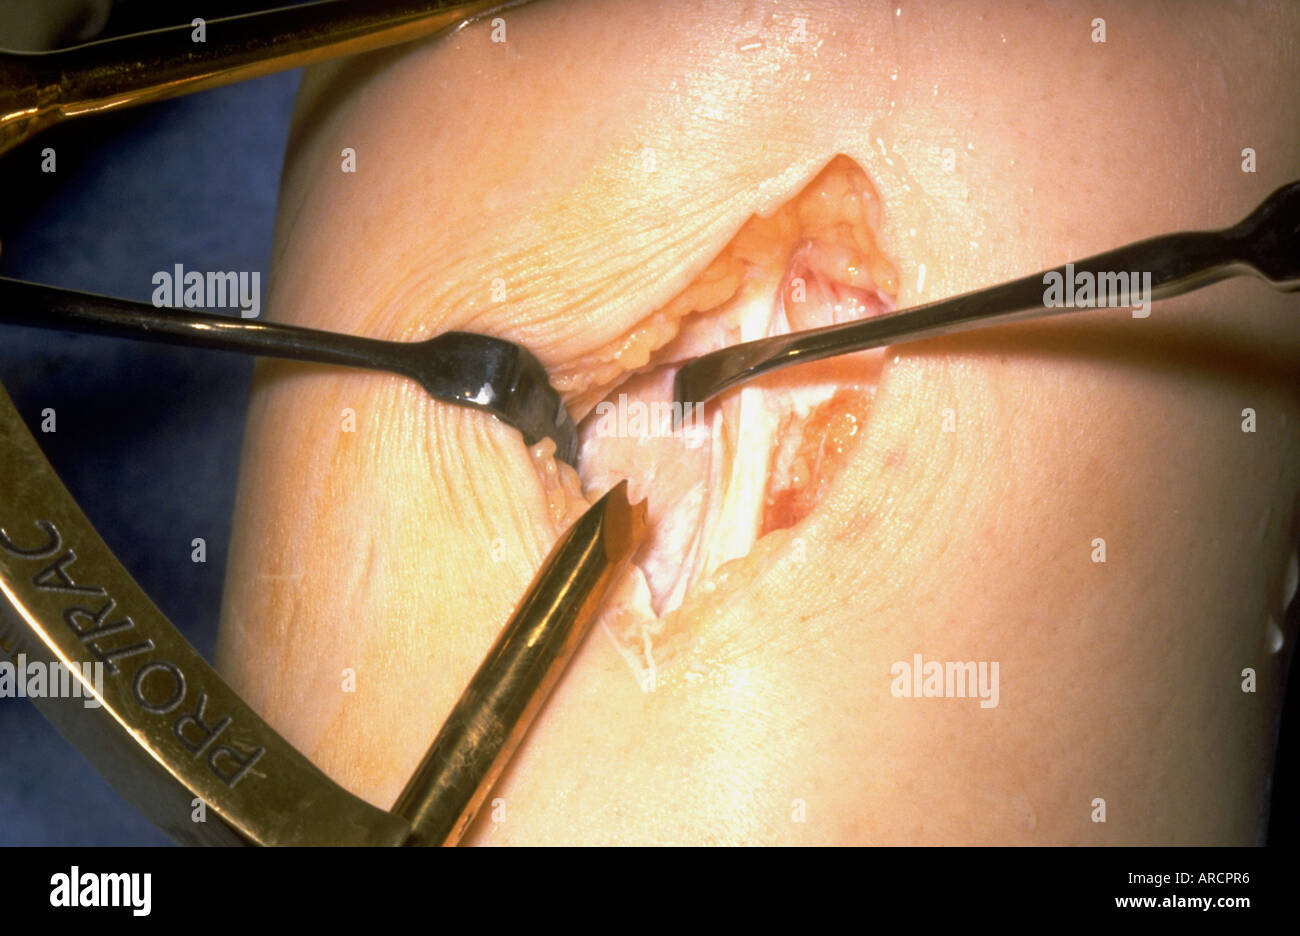 Anterior cruciate ligament reconstruction - Stock Image